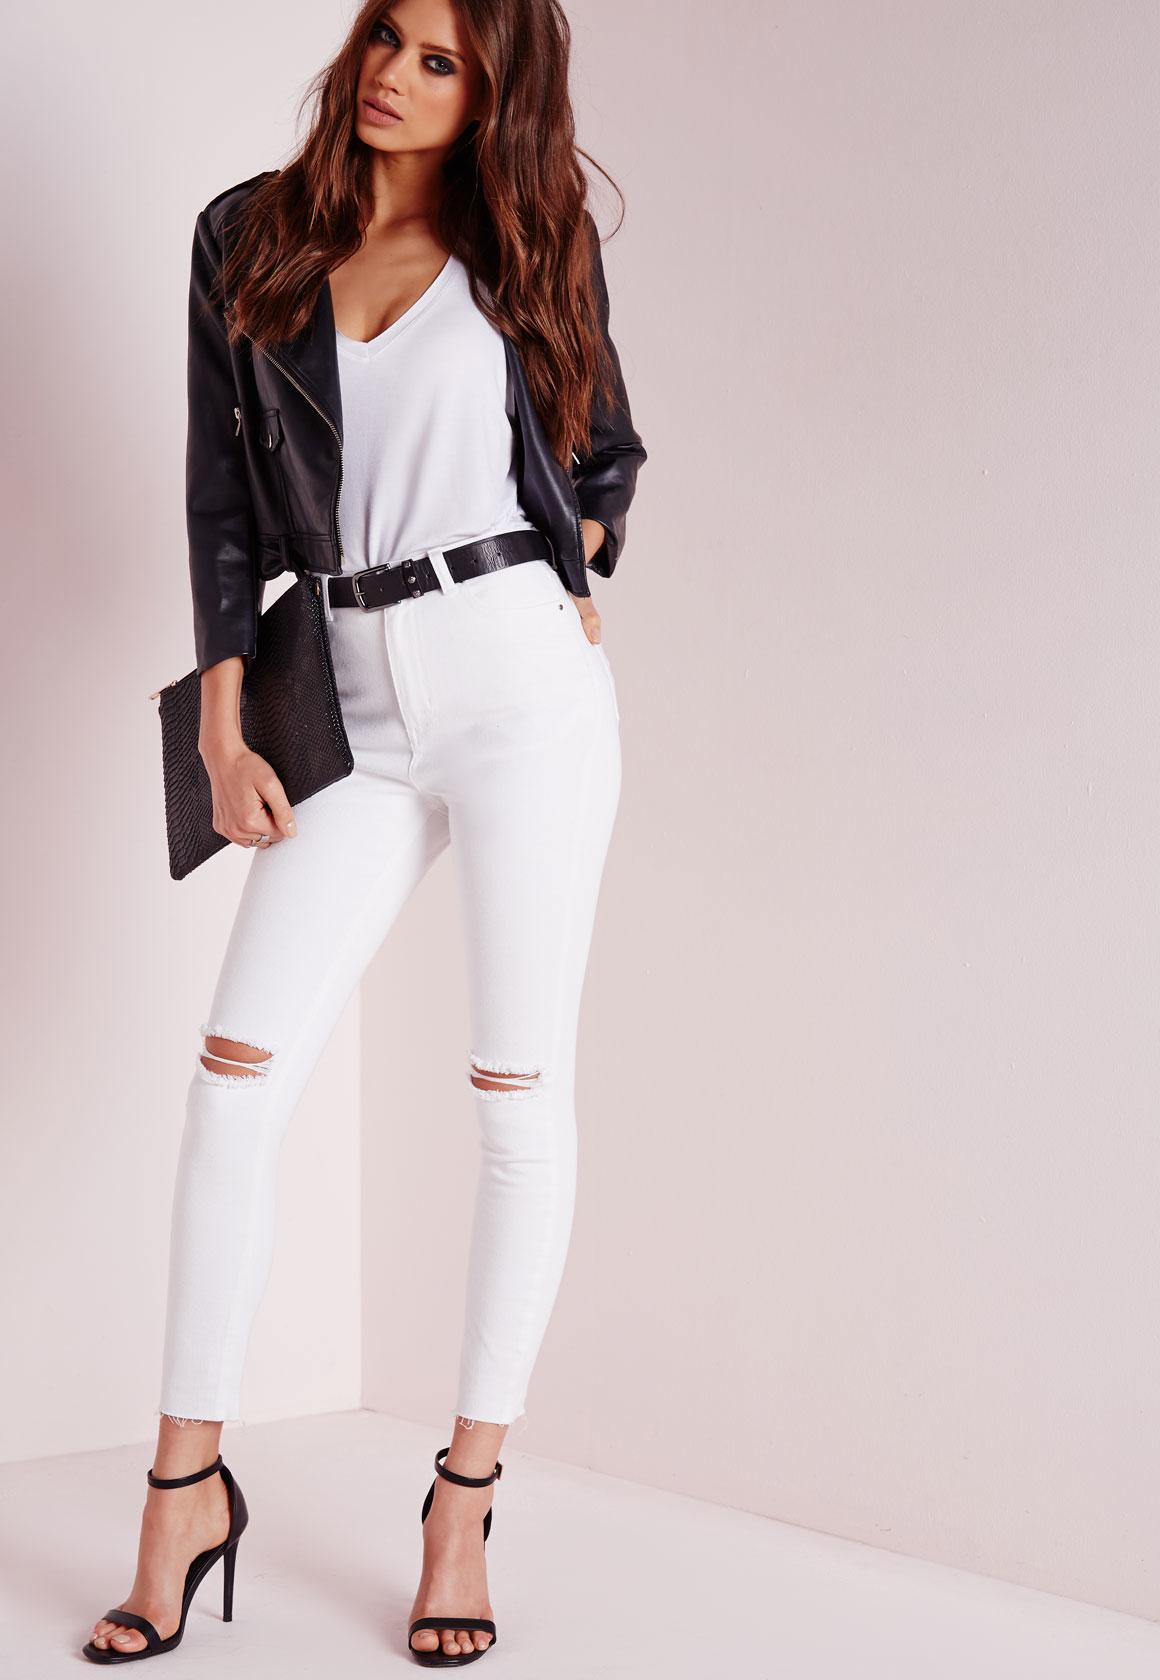 00ba9c9fde5 Lyst - Missguided Edie Ripped Knee Raw Hem Ankle Grazer Skinny Jeans ...